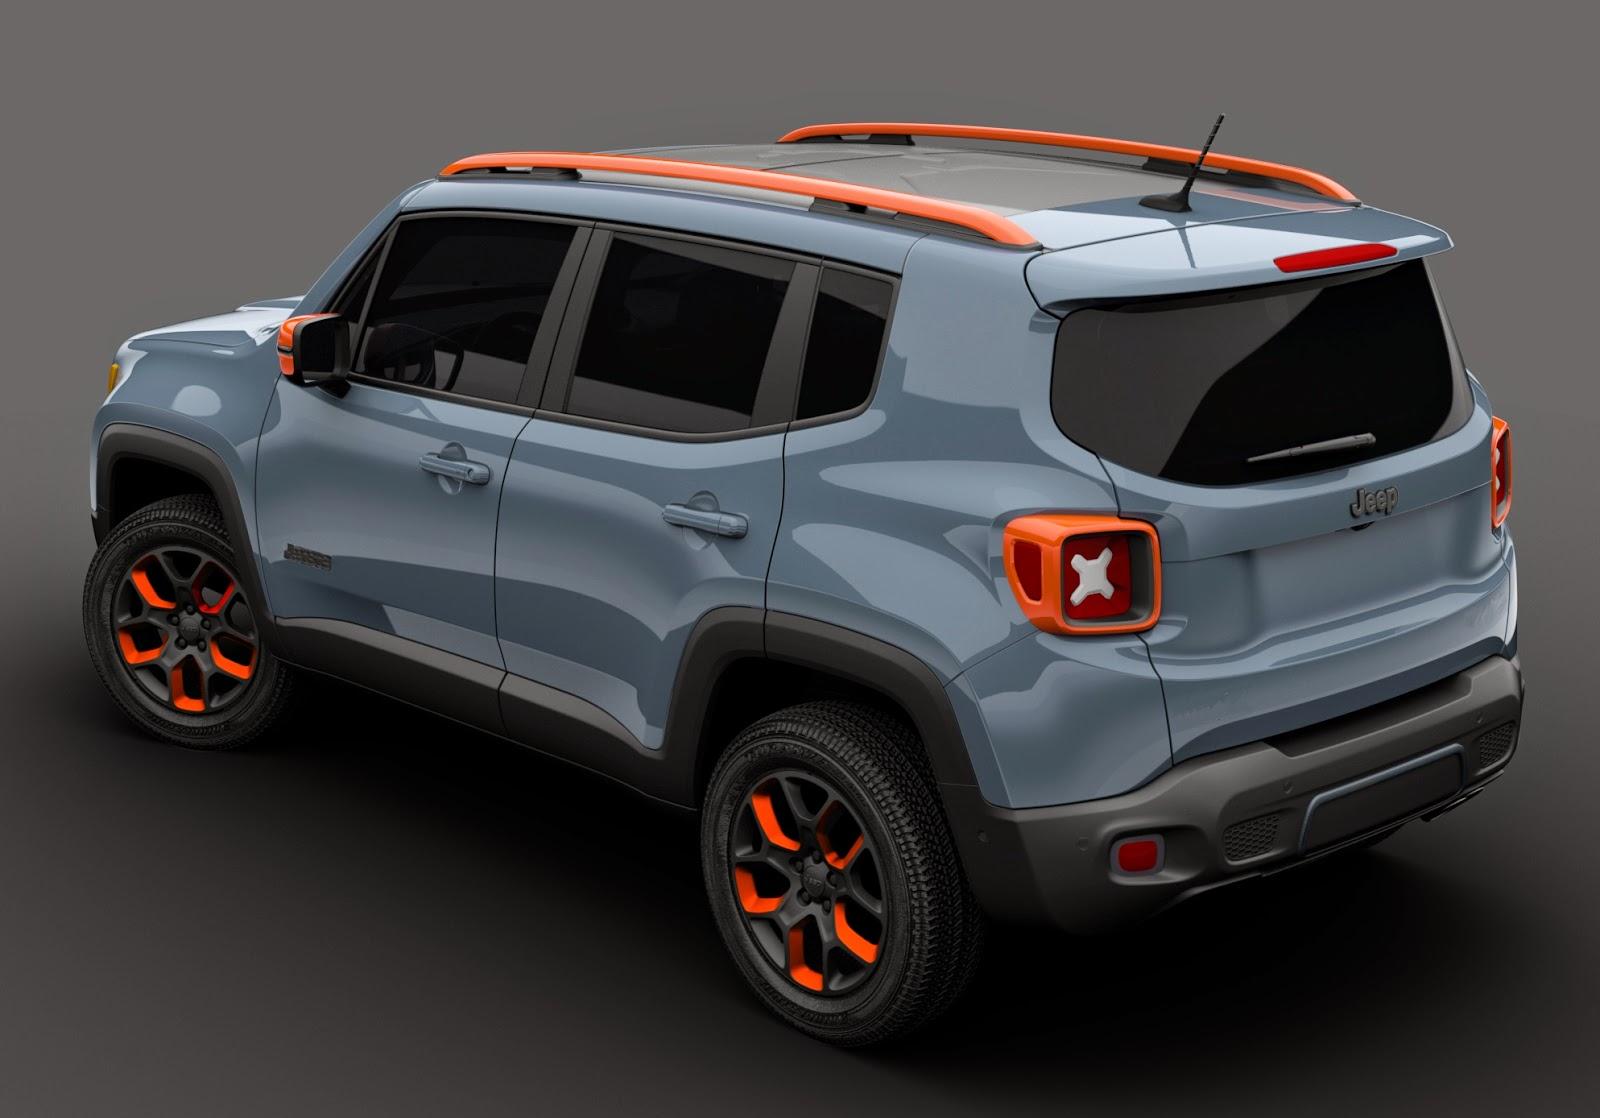 2015 Willys Jeep >> Mopar apresenta customizações do Jeep Renegade